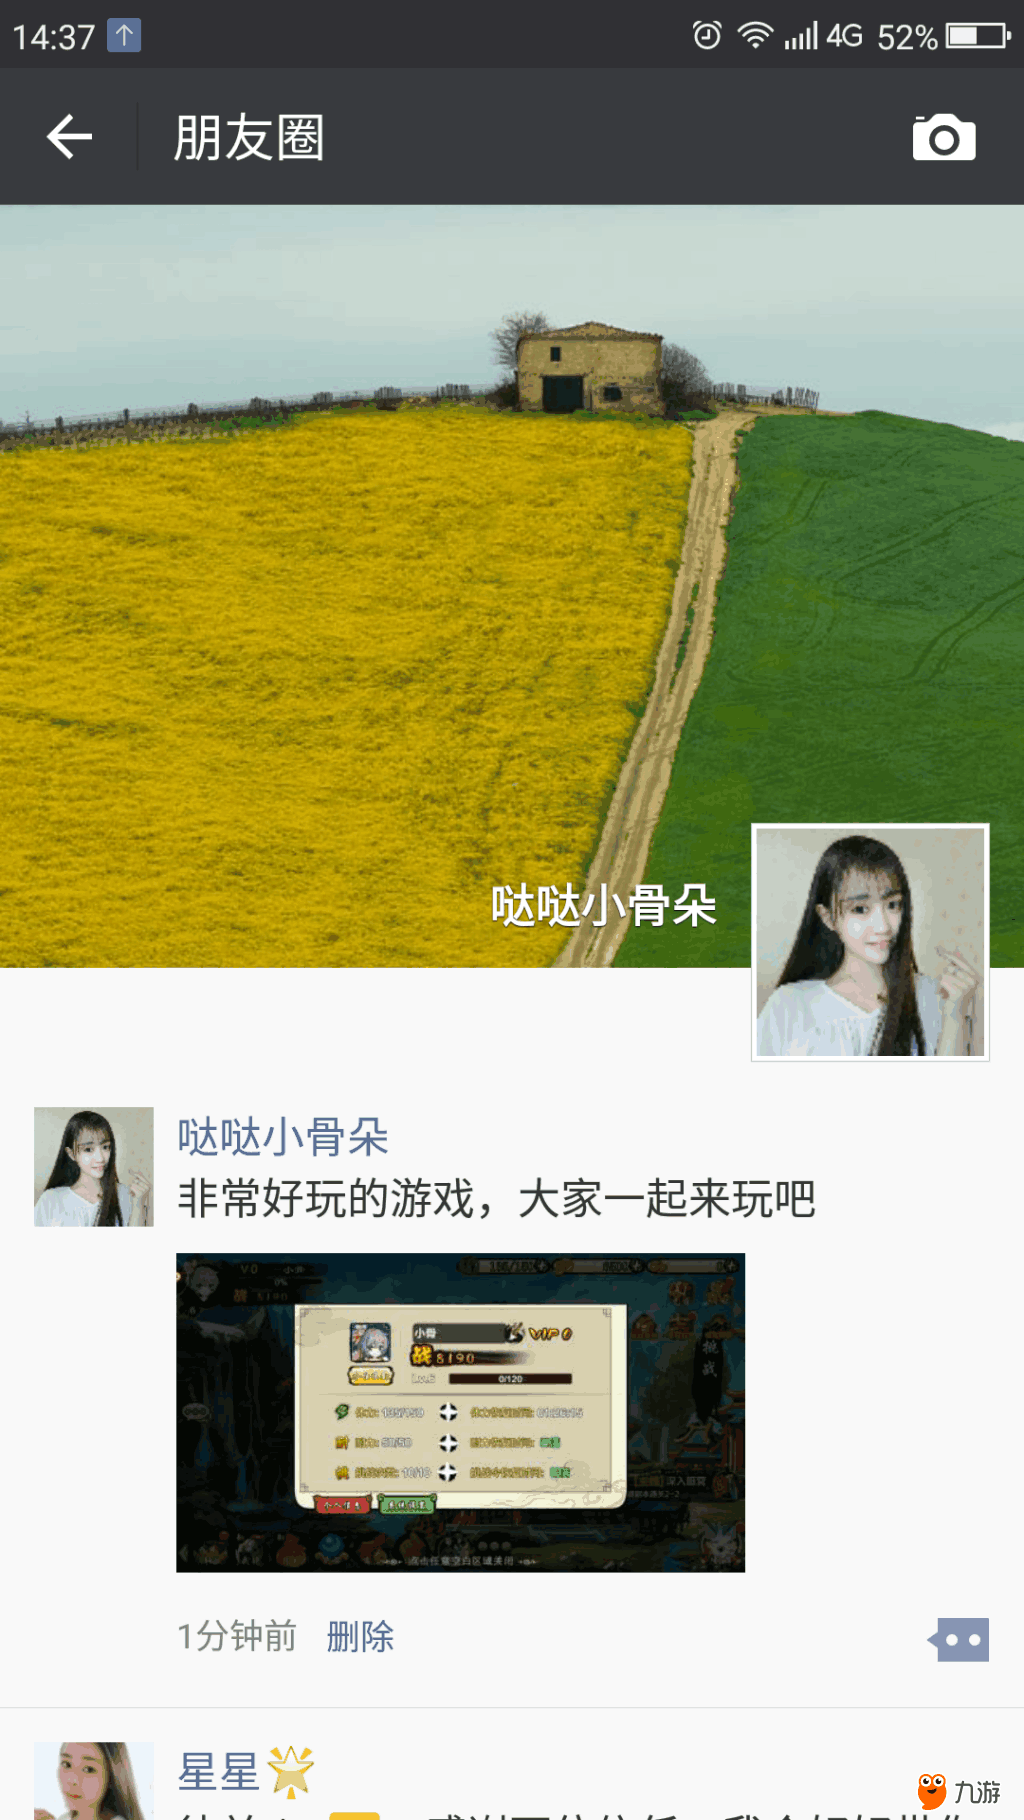 QQ图片20180616143700.png